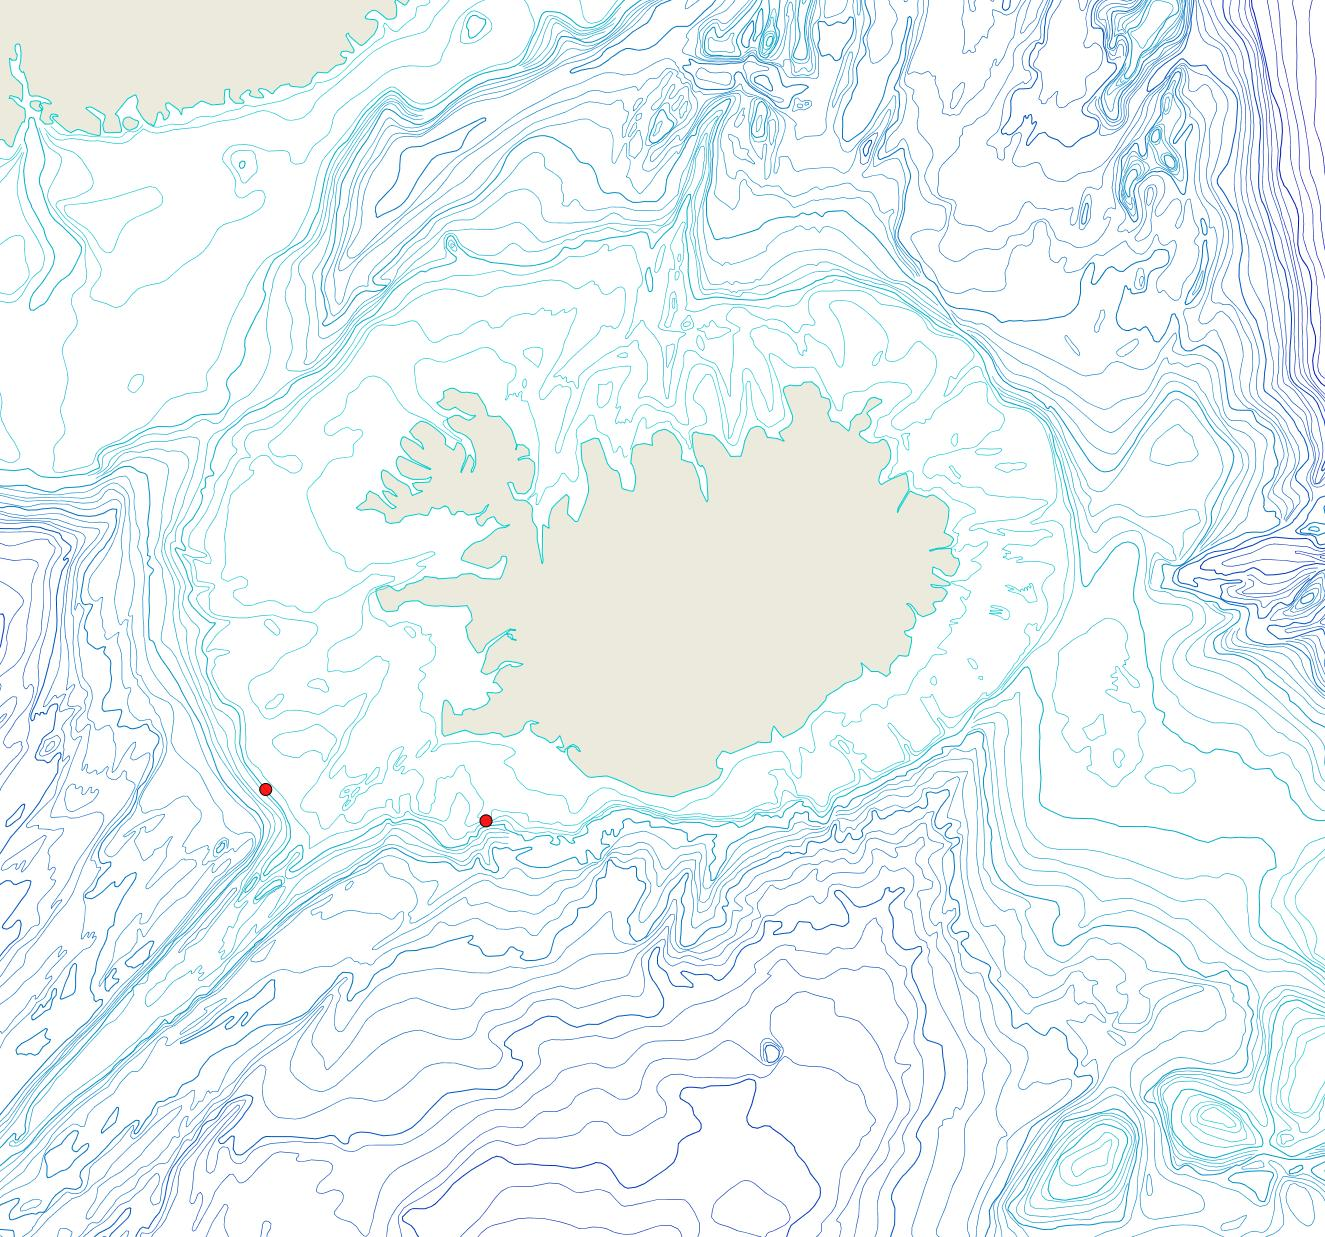 Útbreiðsla Escharina dutertrei haywardi(Bioice samples, red dots)